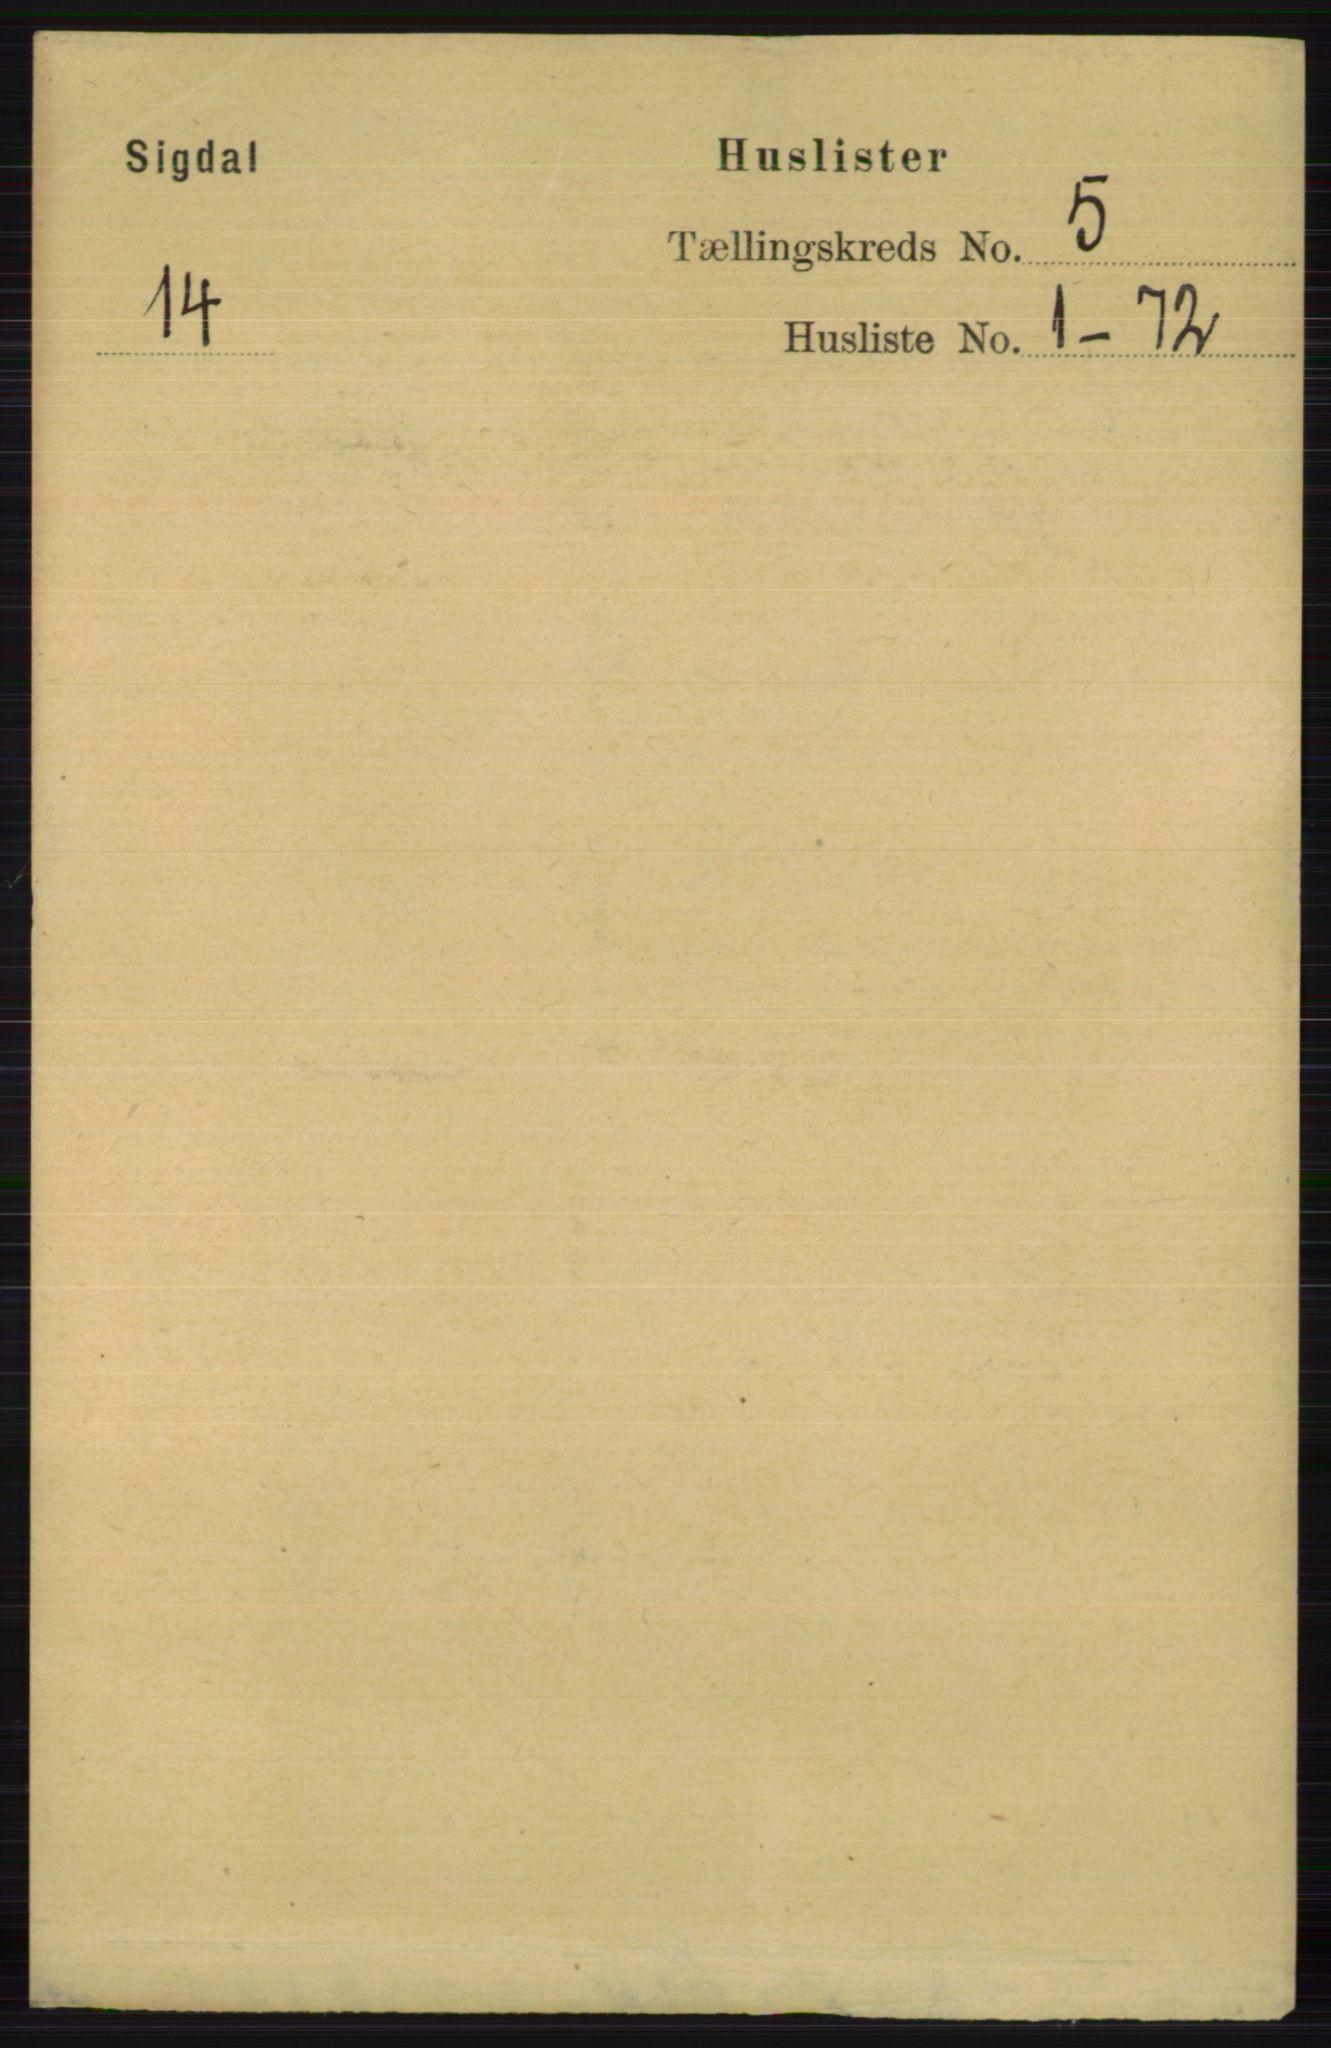 RA, Folketelling 1891 for 0621 Sigdal herred, 1891, s. 1848